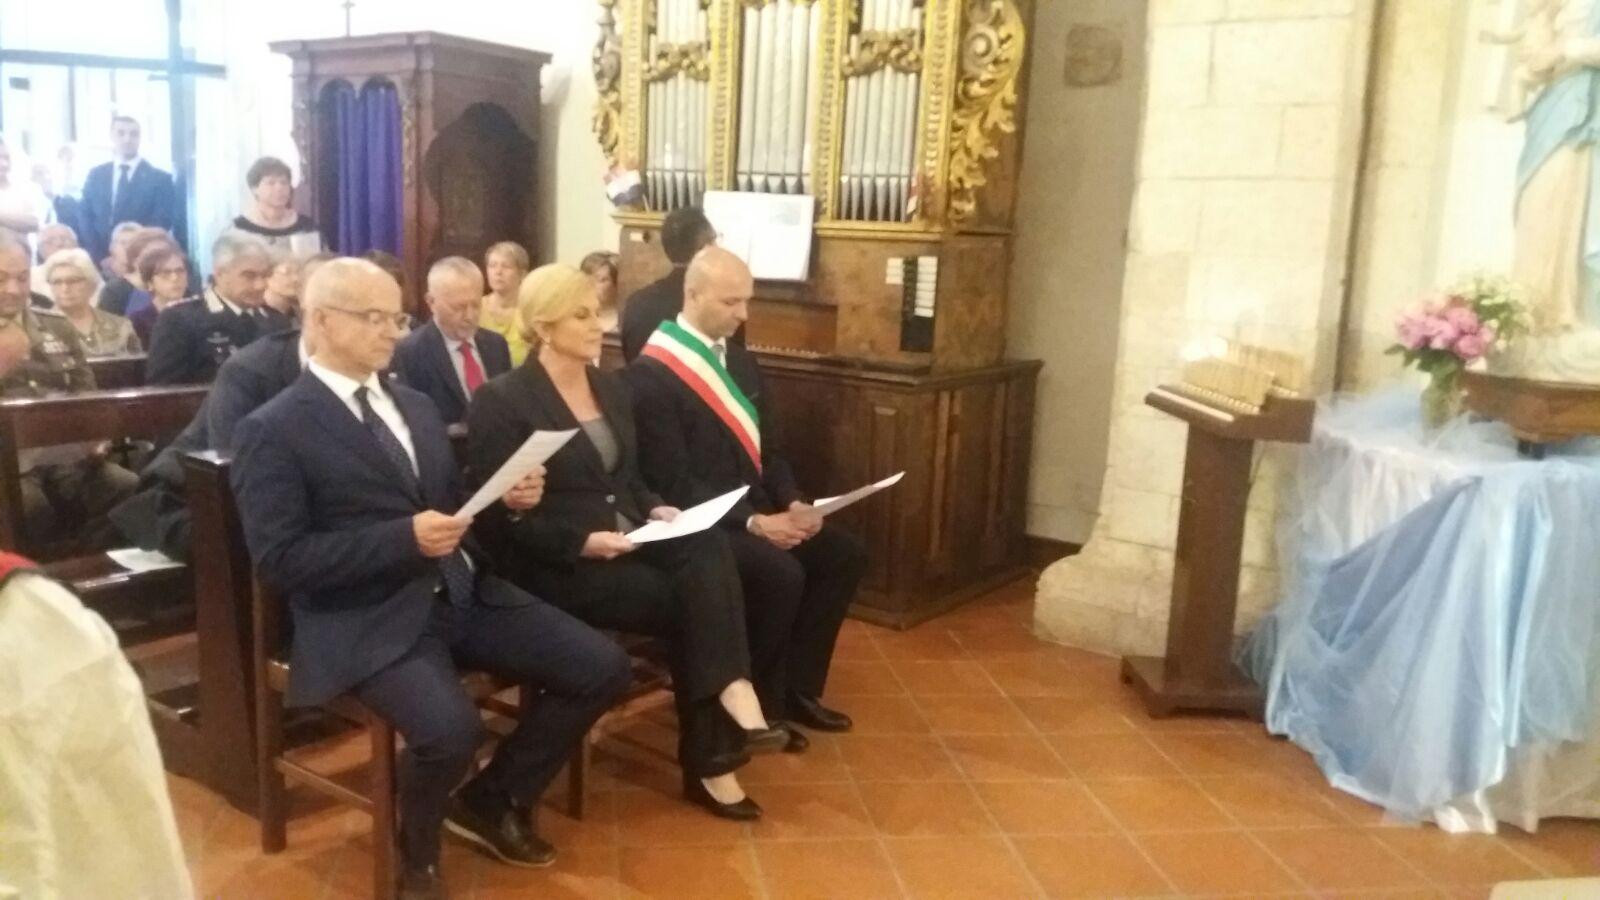 Il Presidente Kolinda Kitarović in visita nei paesi croati del Molise